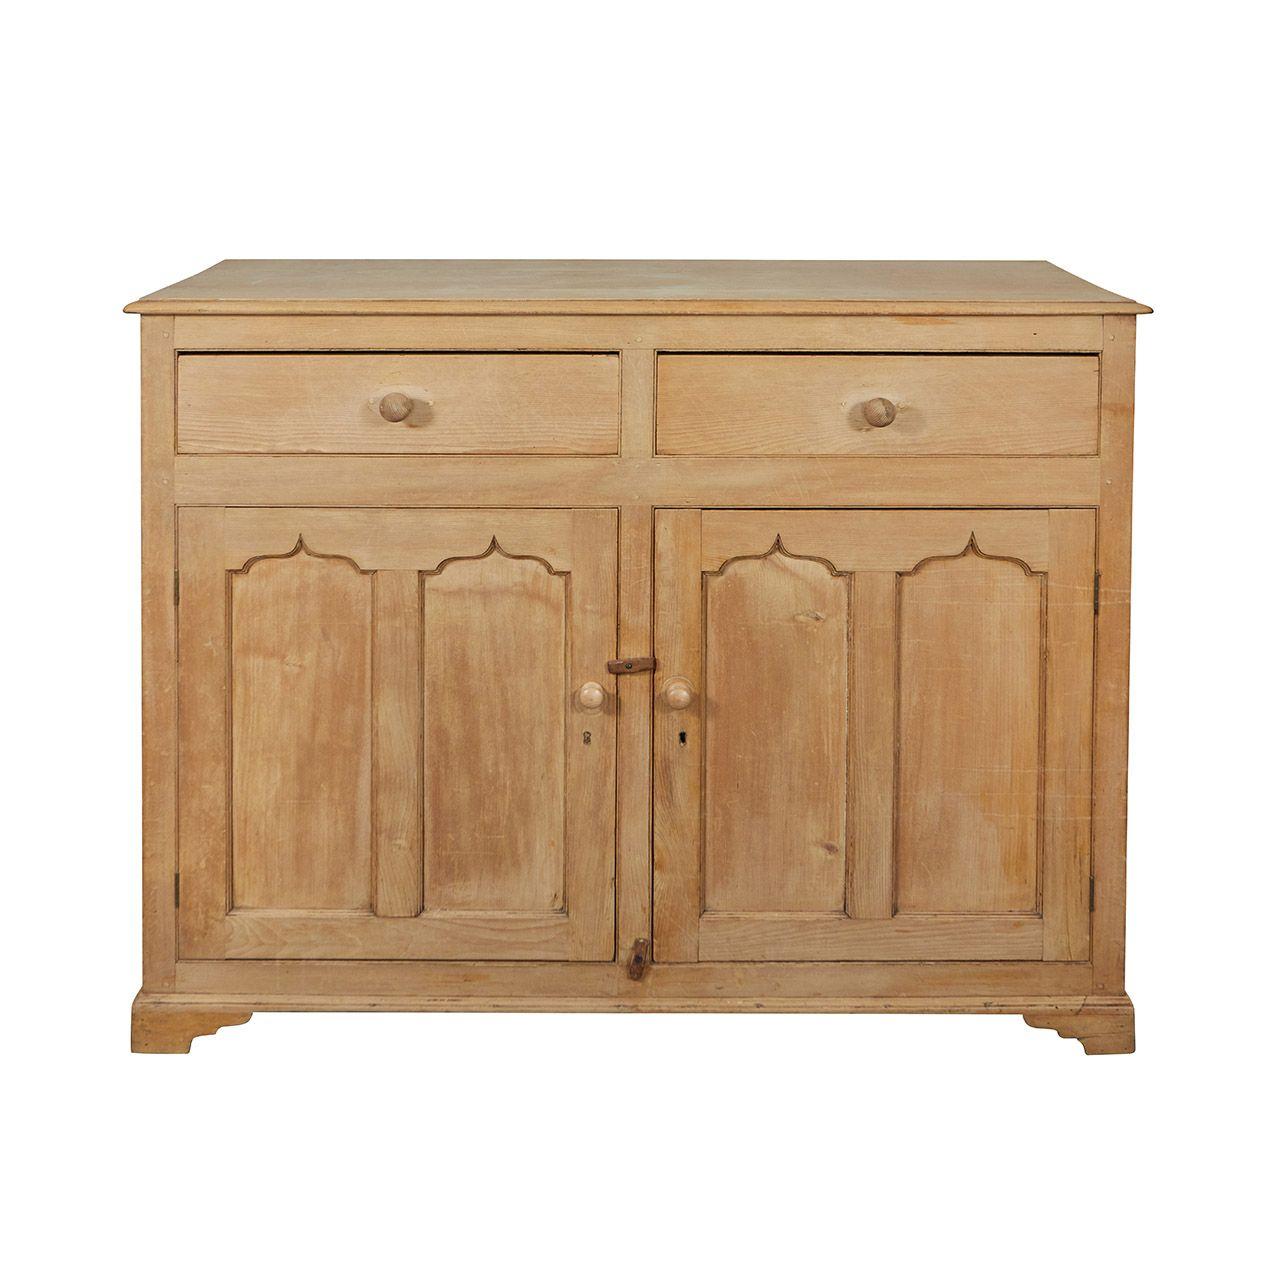 English Pine Cabinet Cupboard Kitchen Cabinets And Cupboards Pine Cabinets Wood Kitchen